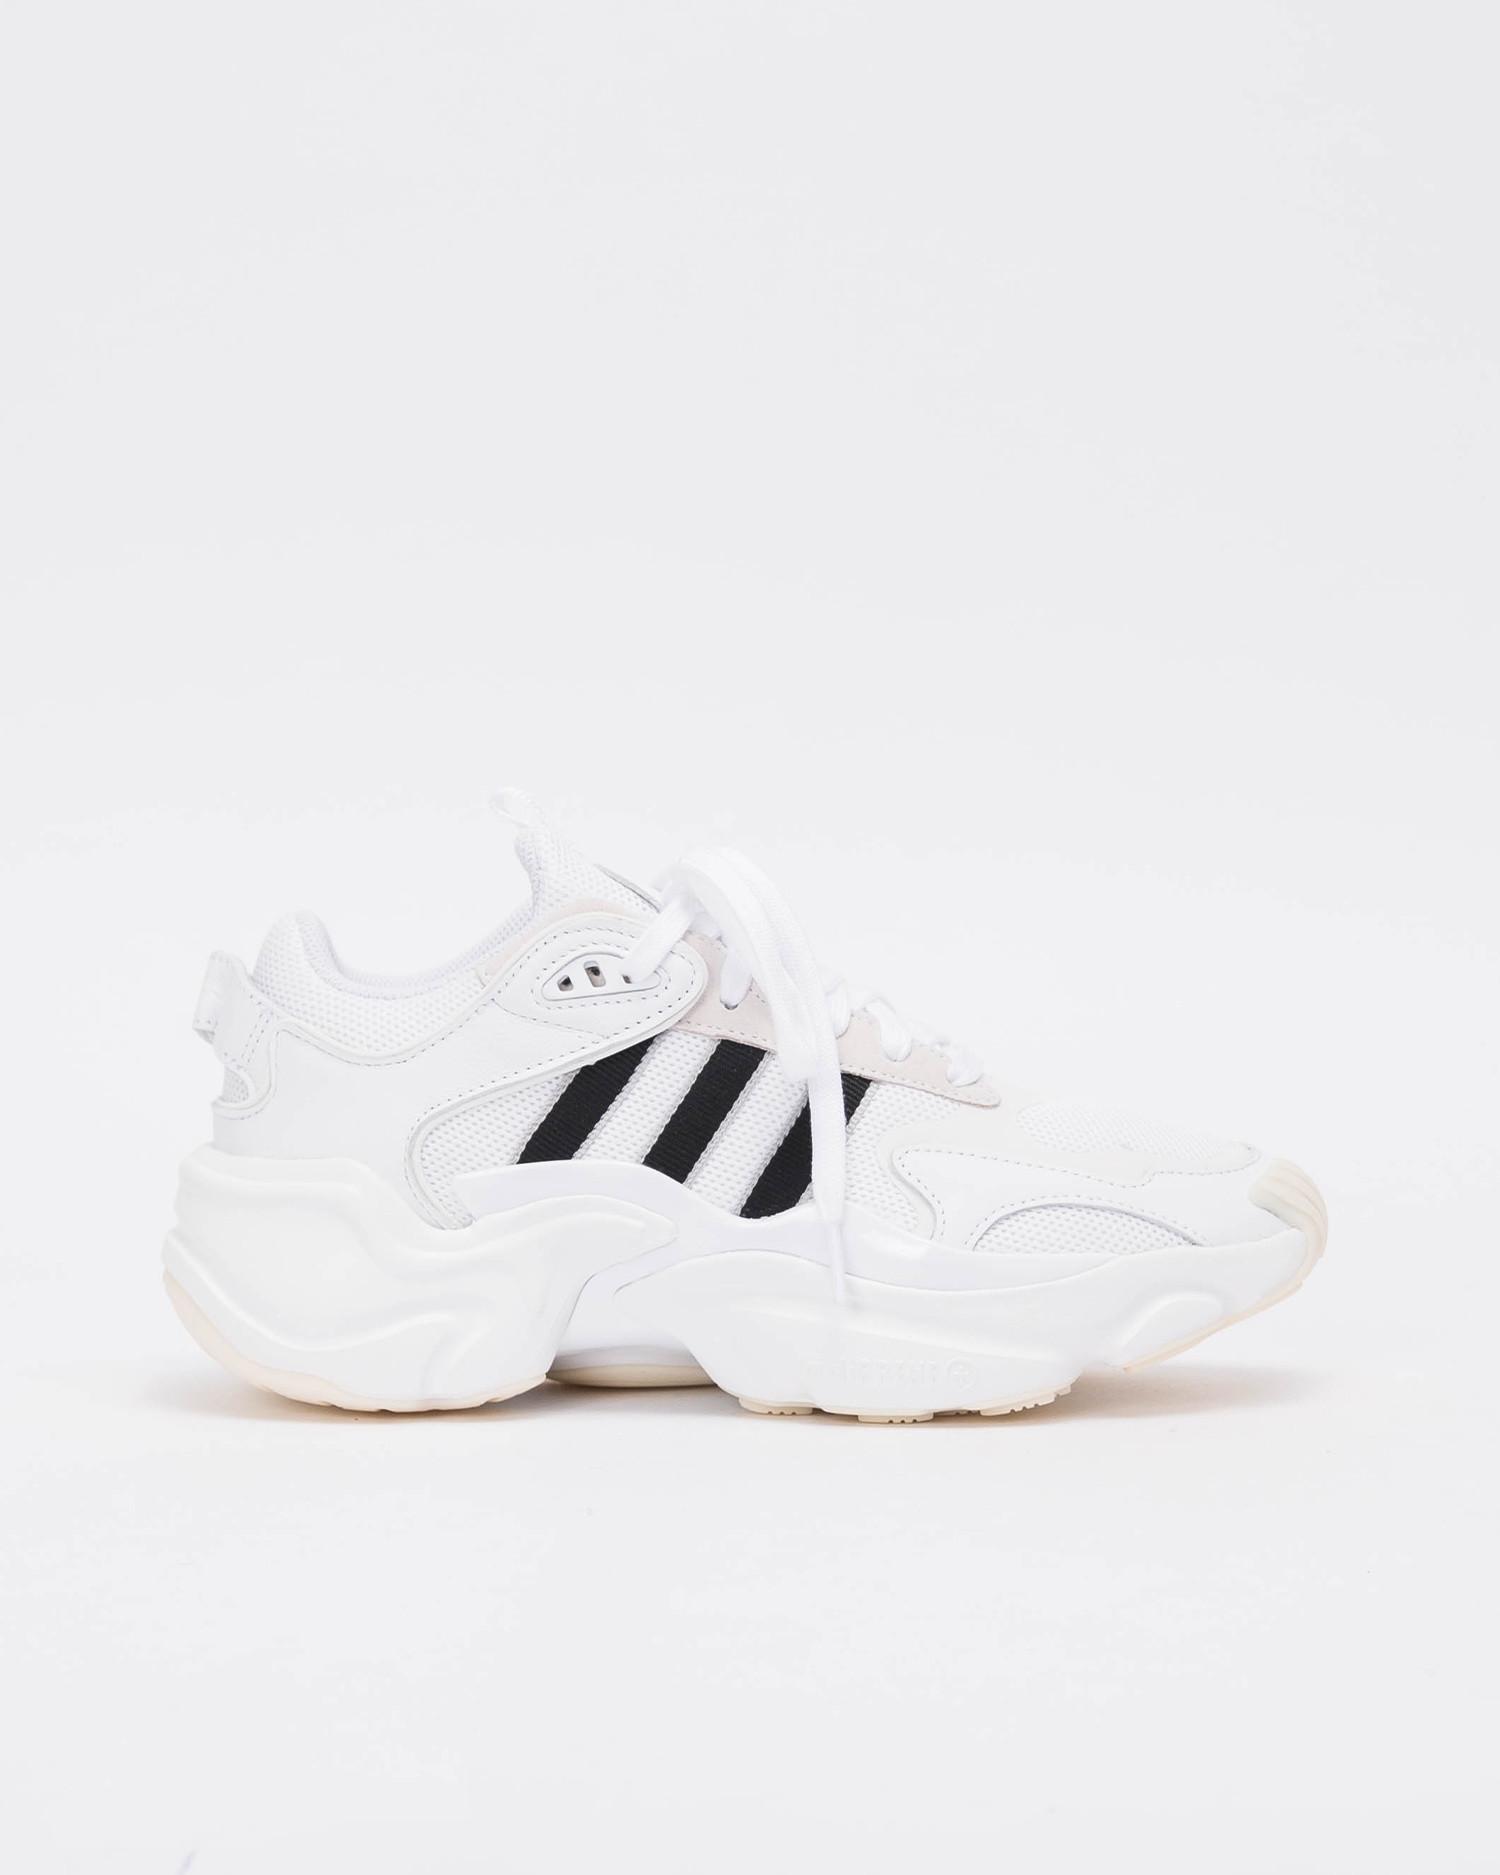 Adidas W Magmur runner Ftwwht/Cblack/Gretwo